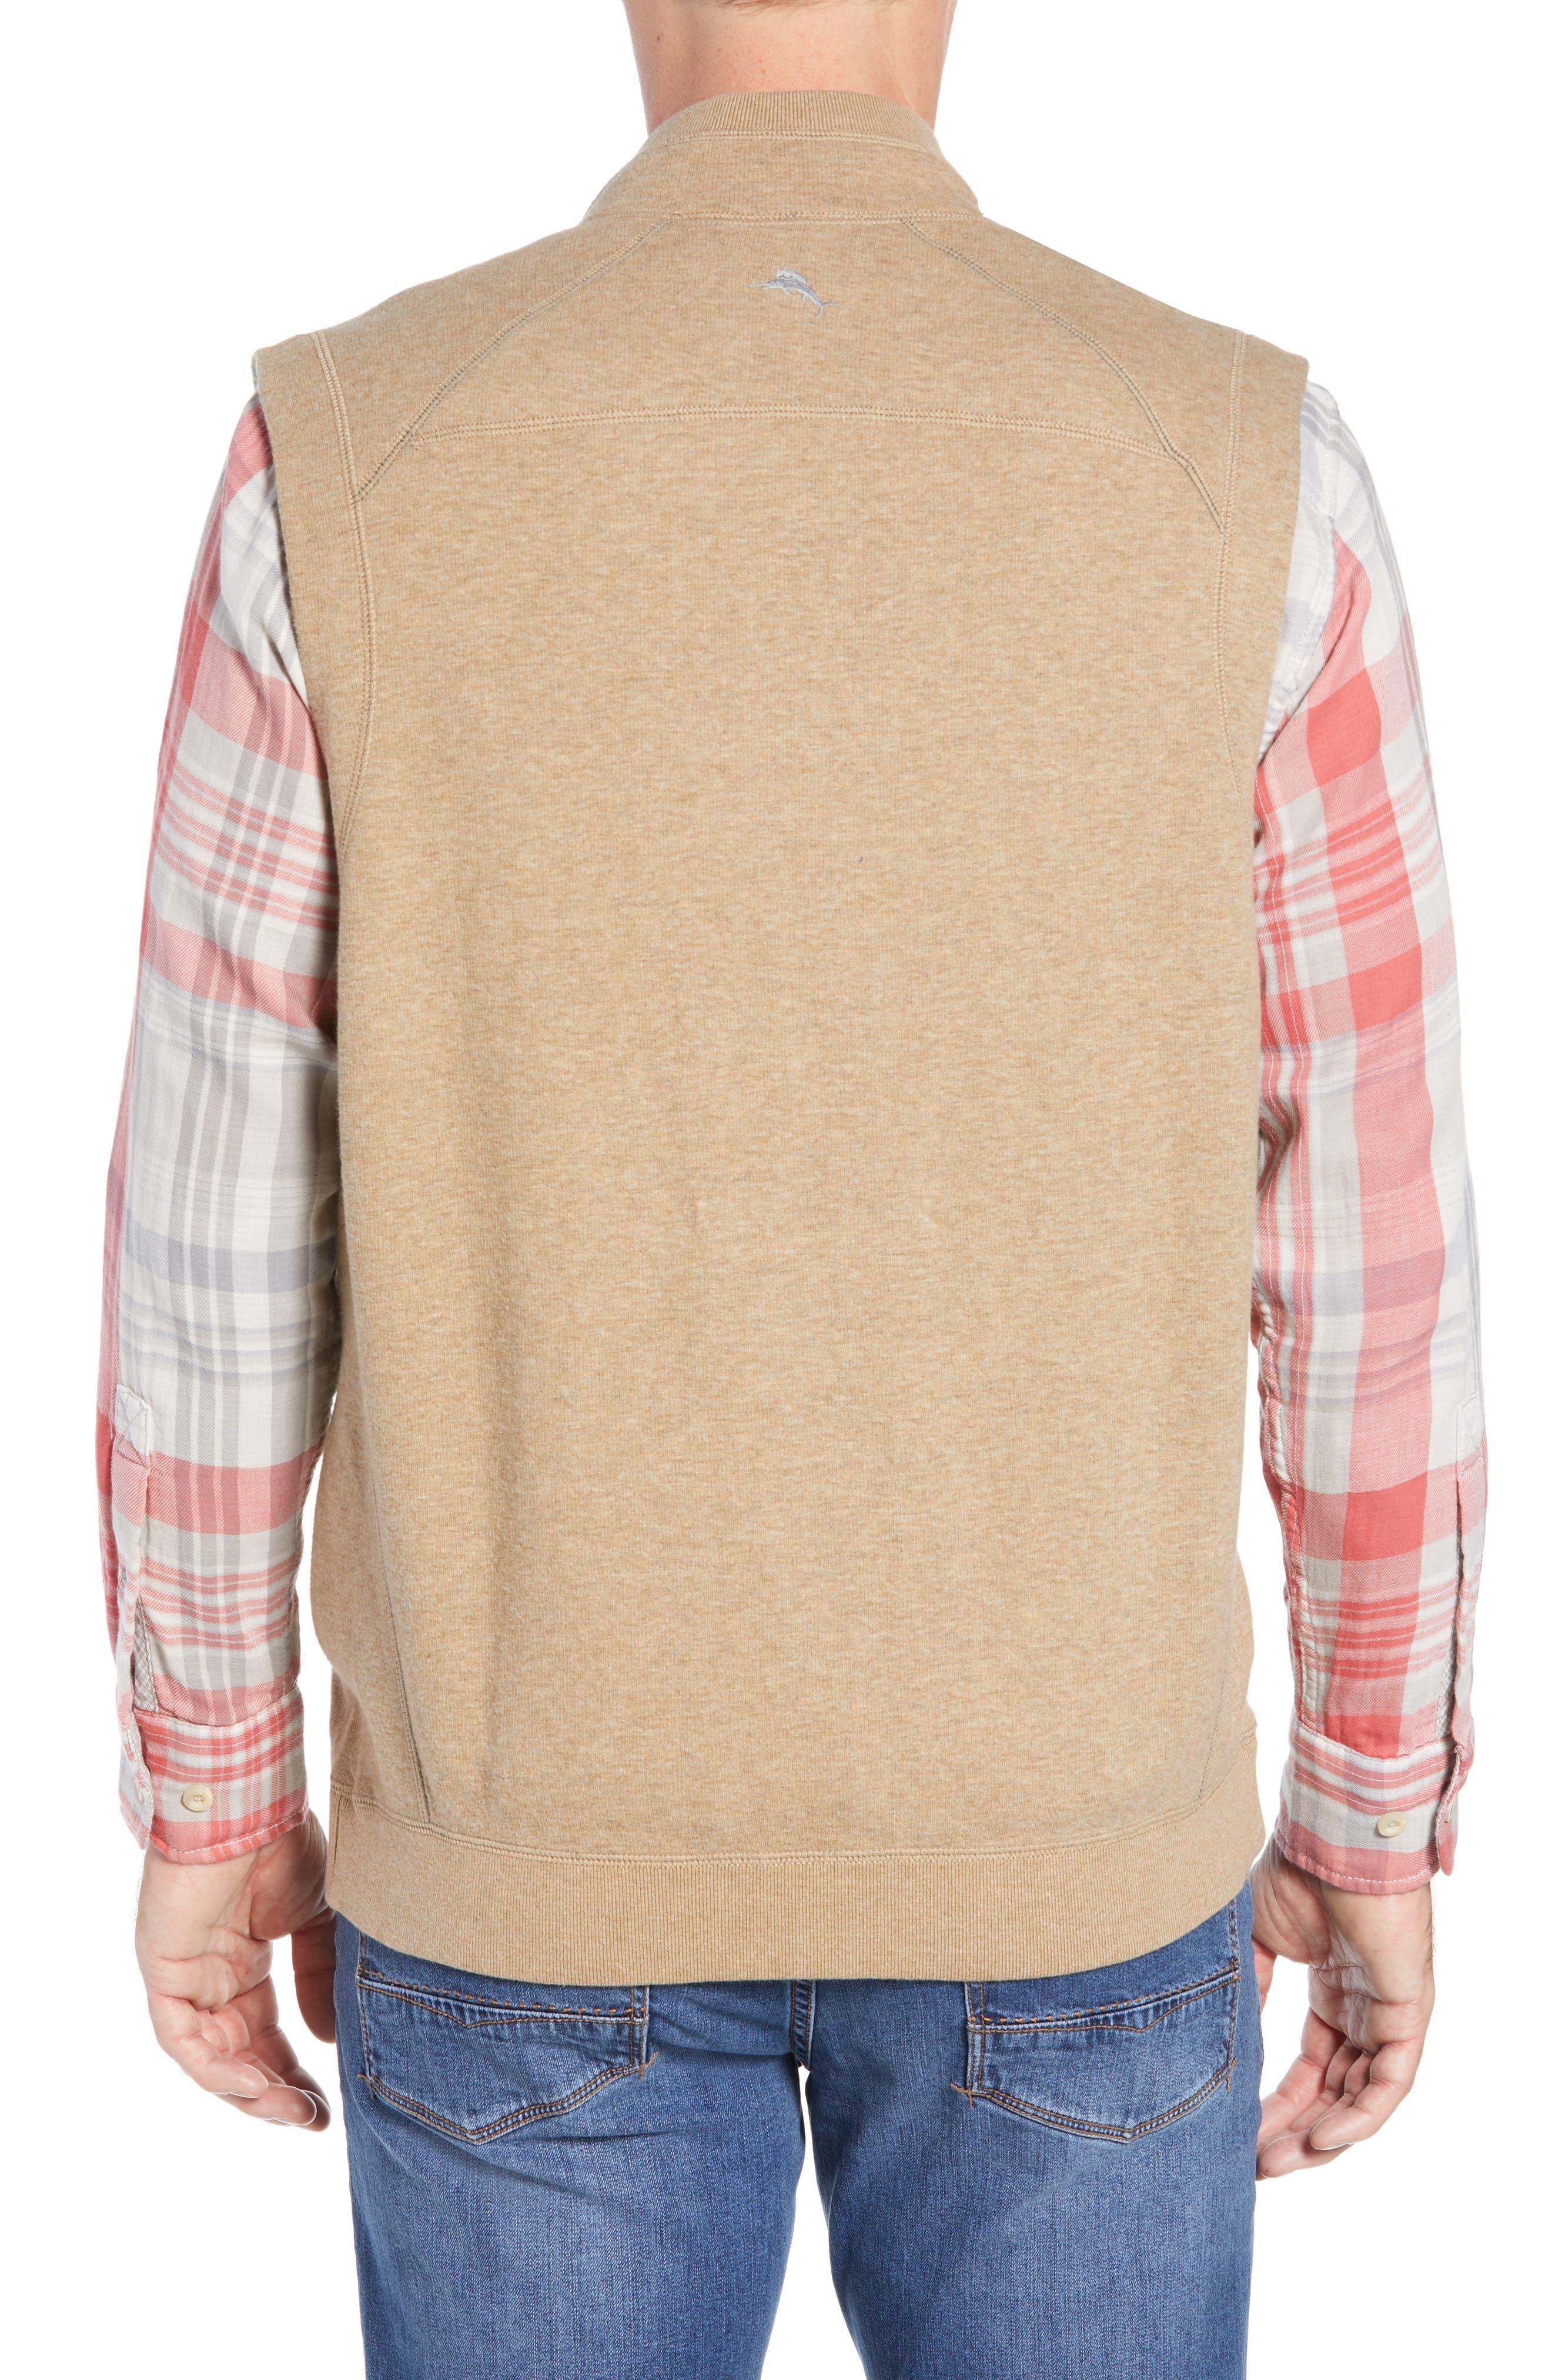 Flip Side Reversible Zip Vest,                             Alternate thumbnail 3, color,                             GOLDEN HONEY HEATHER